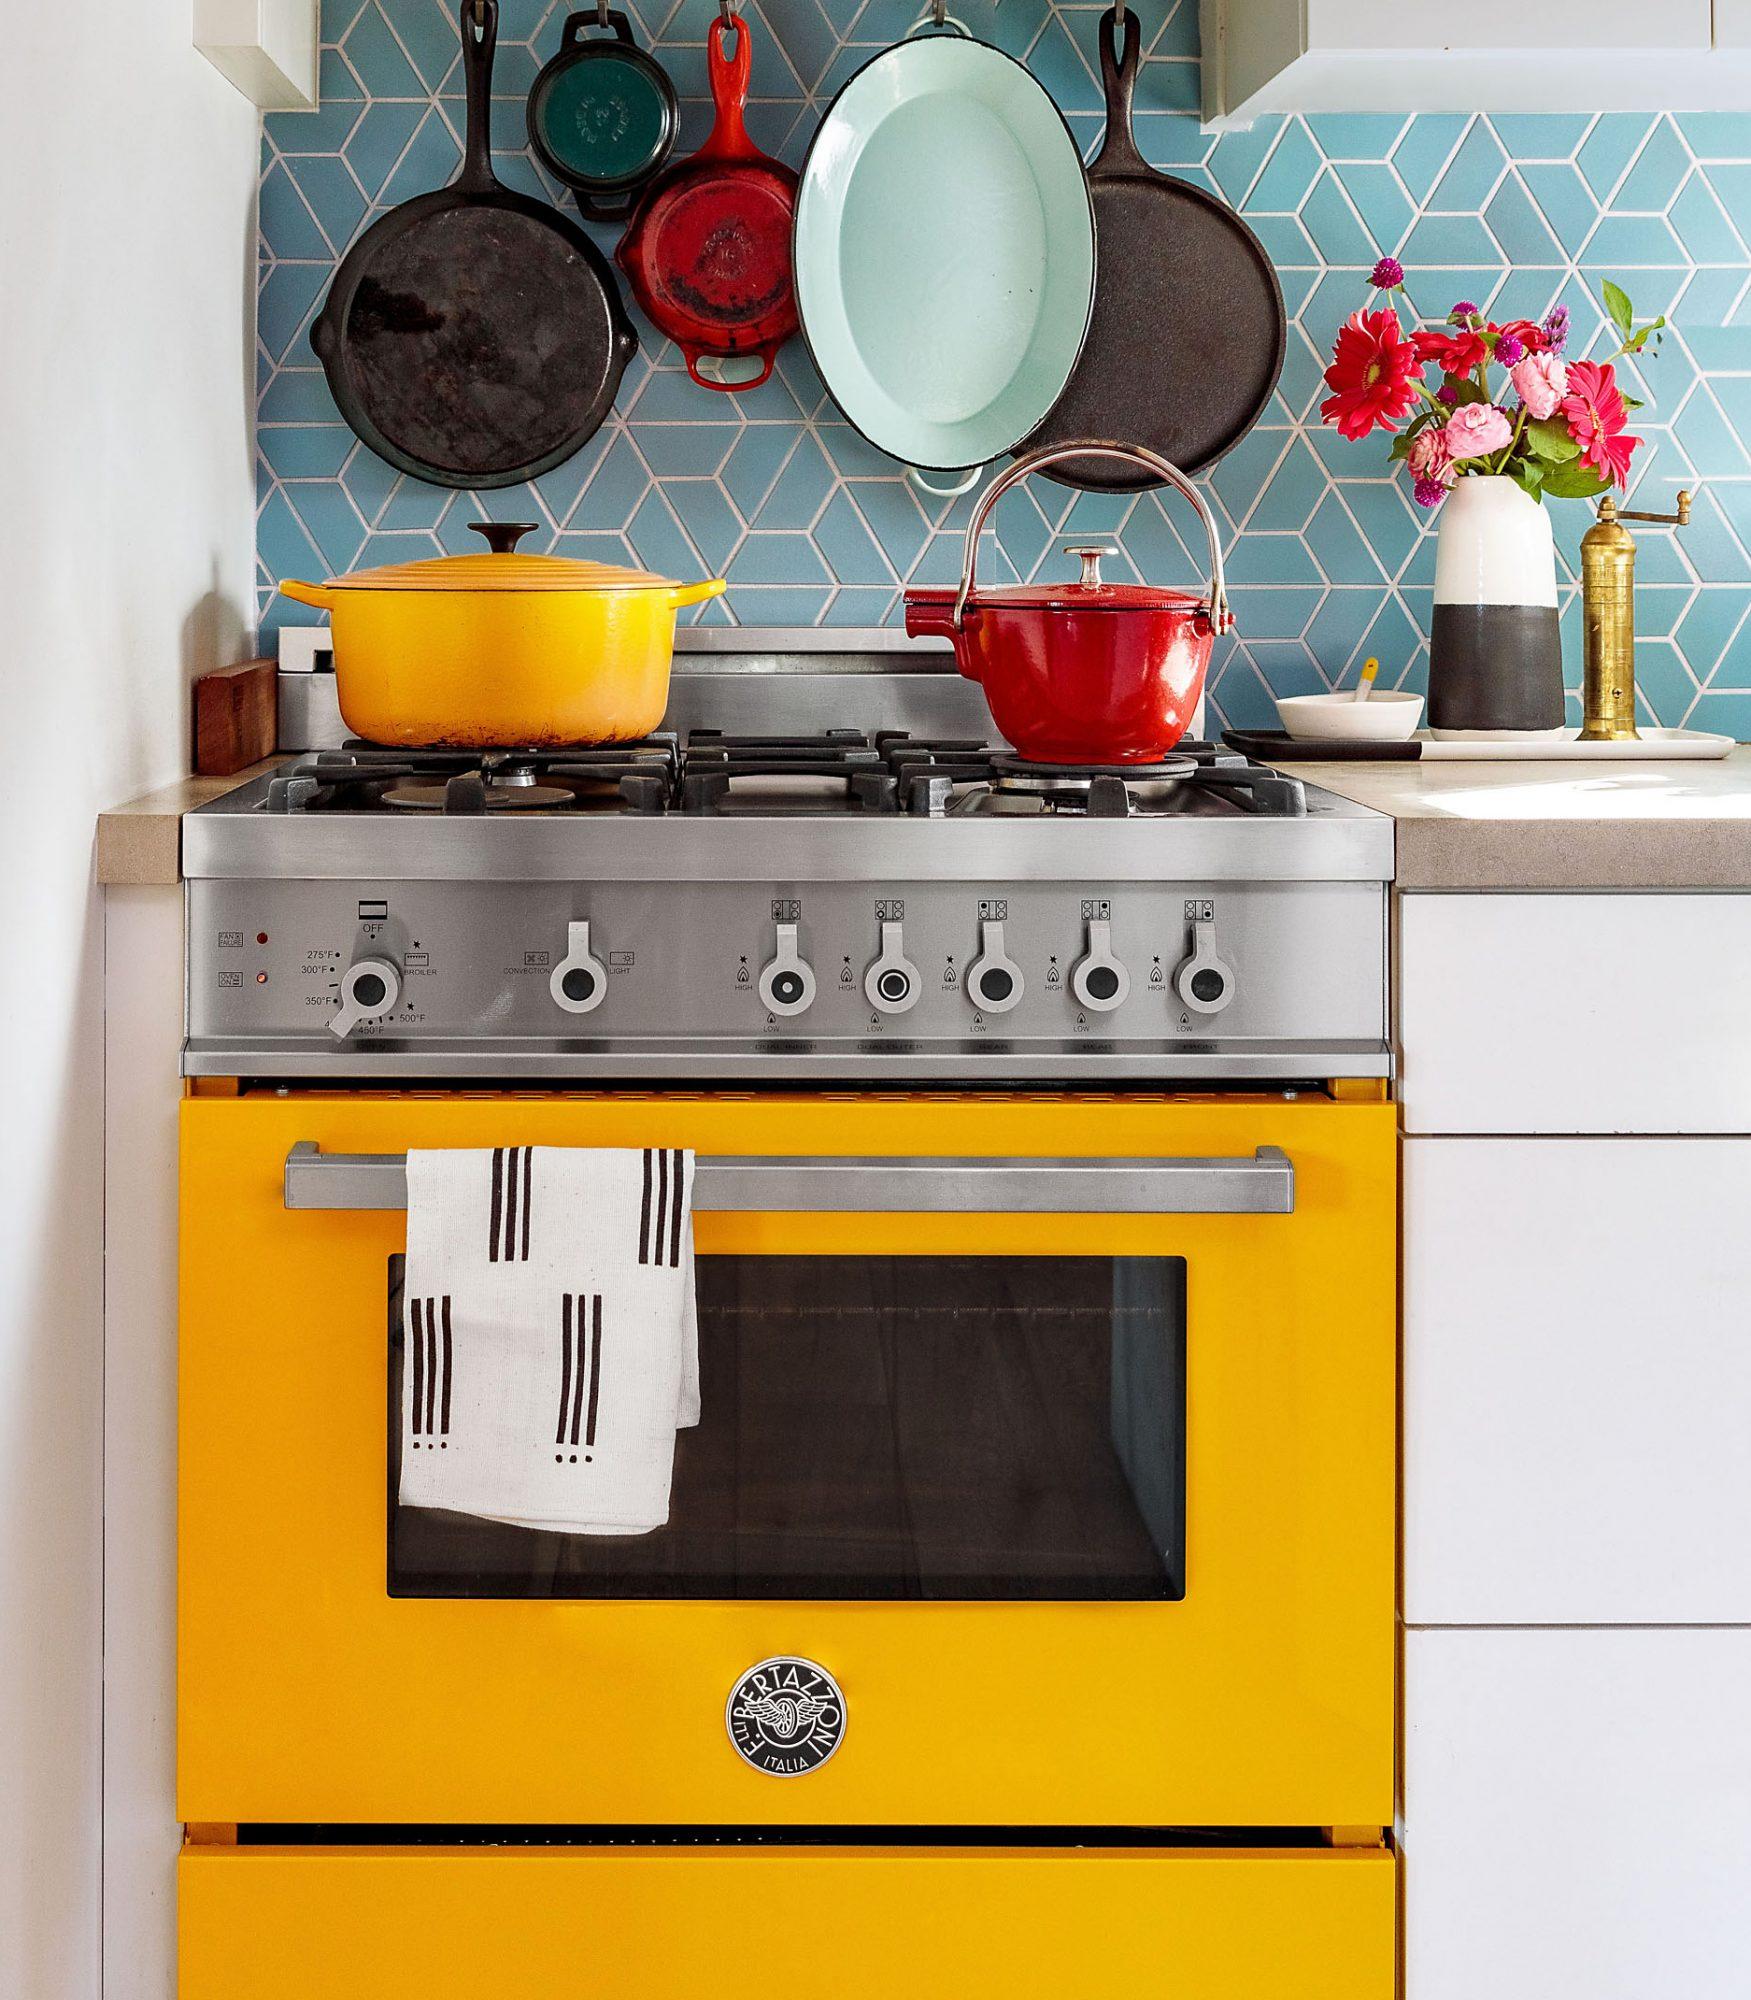 yellow Bertazzoni professional range